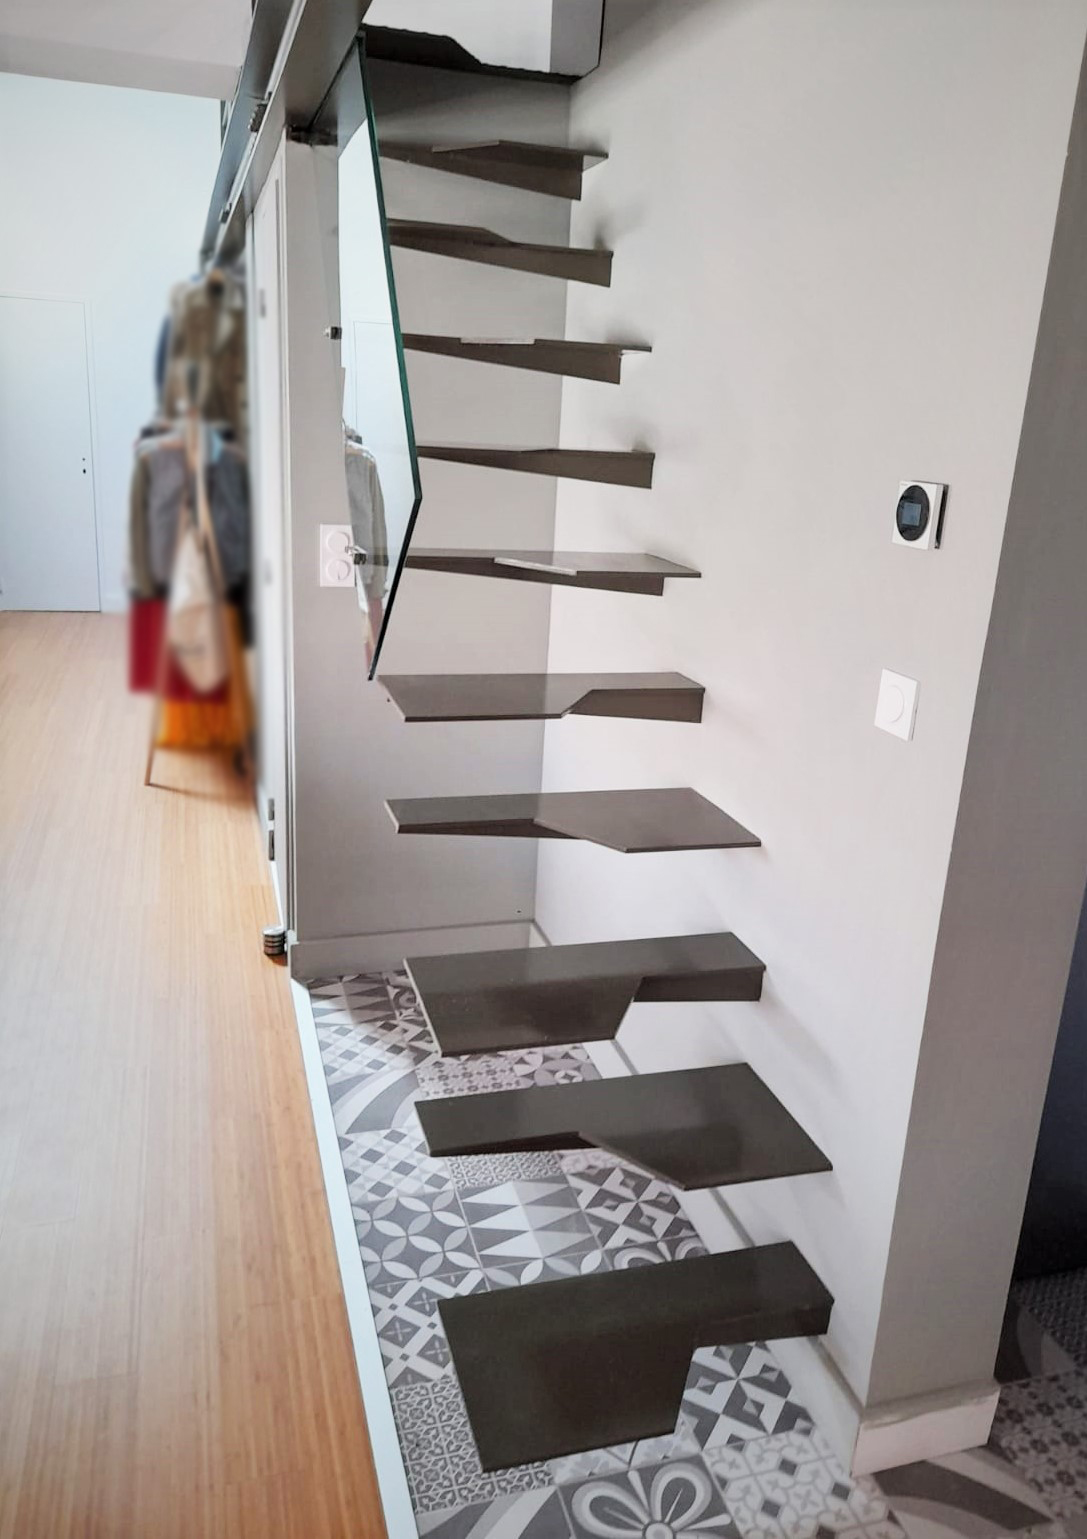 inoxngo-ferronnier-Marseille---escalier-pas-japonais-3bb